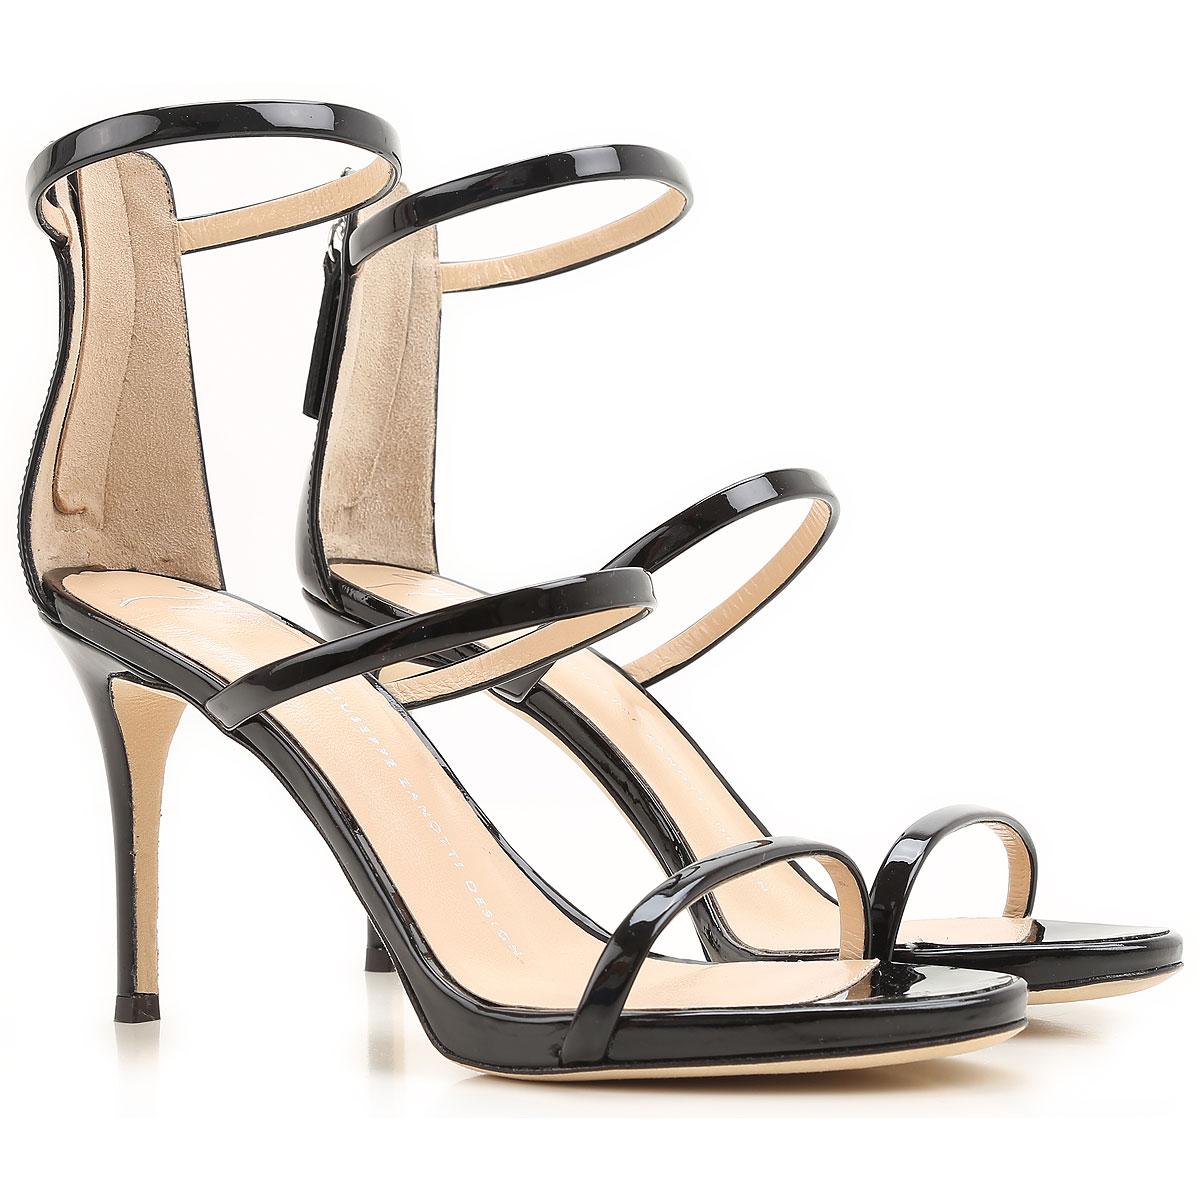 962928c9e Womens Shoes Giuseppe Zanotti Design